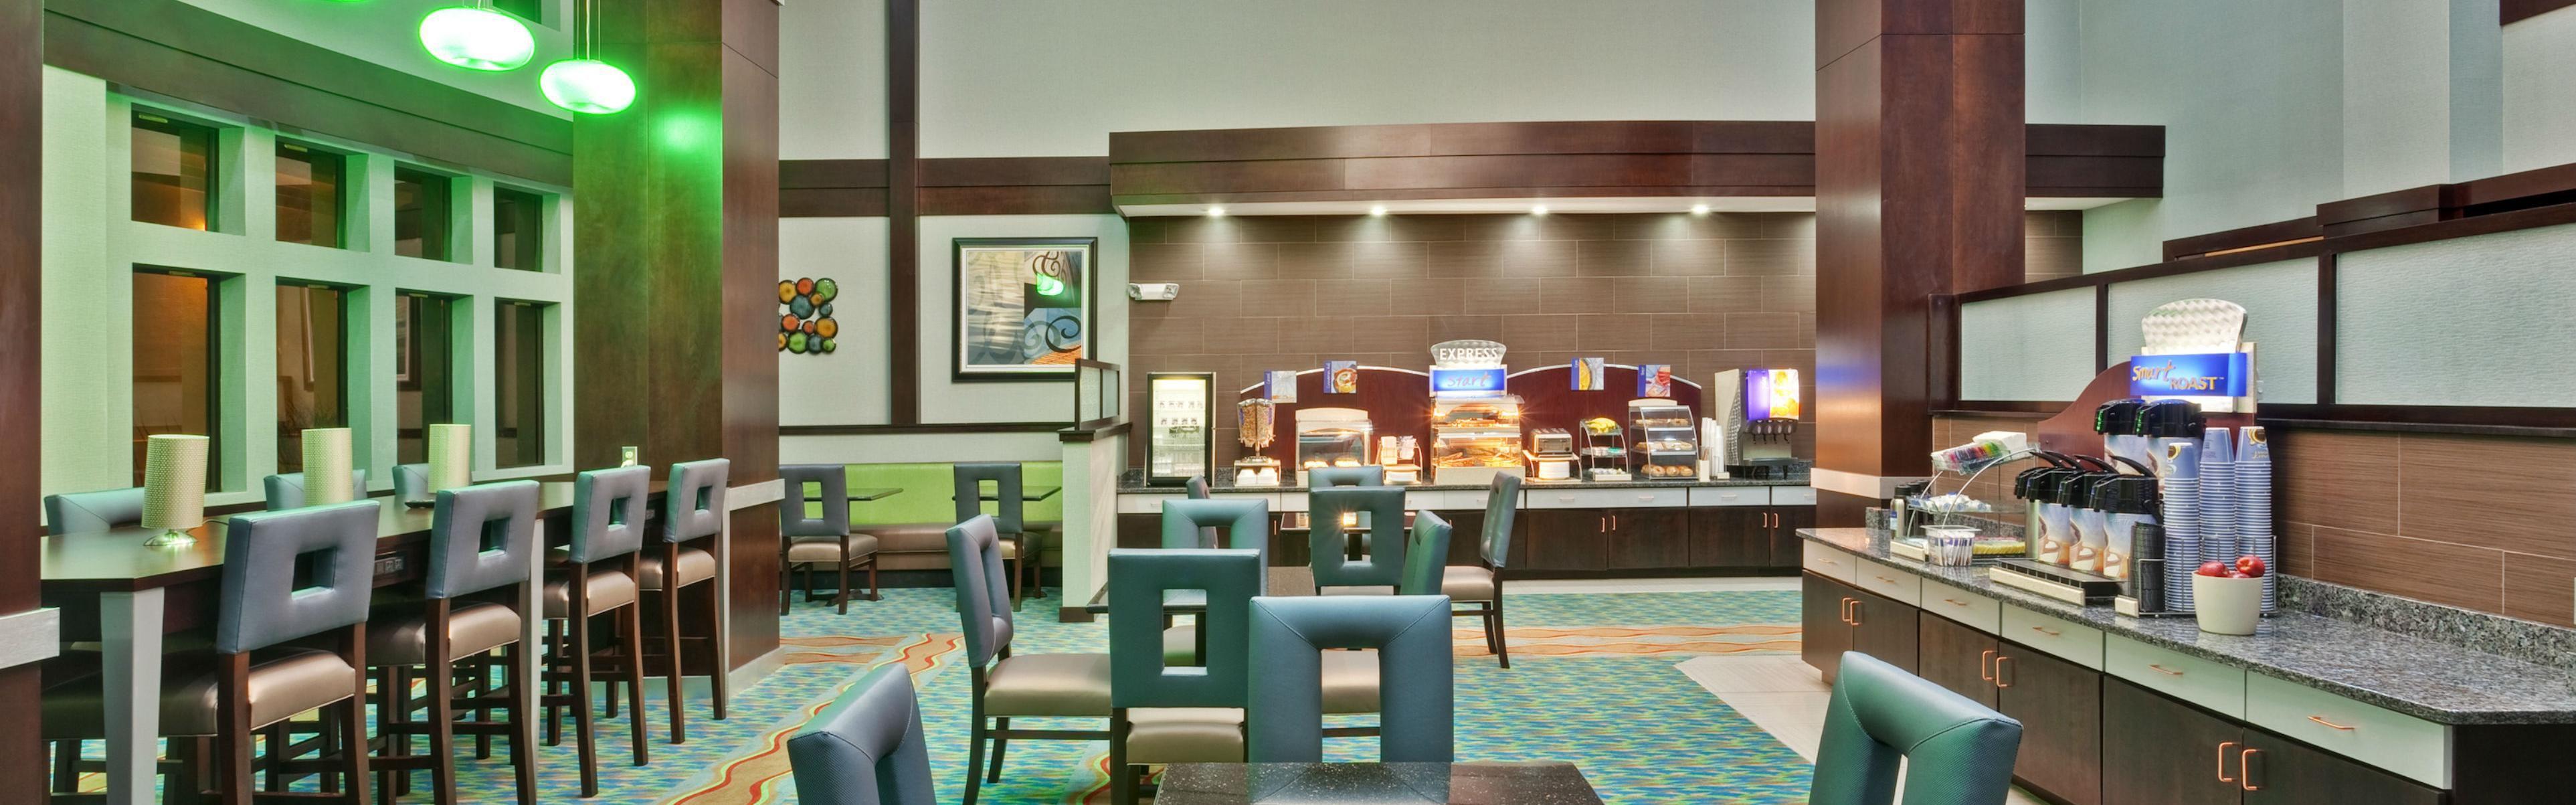 Holiday Inn Express & Suites New Philadelphia image 3